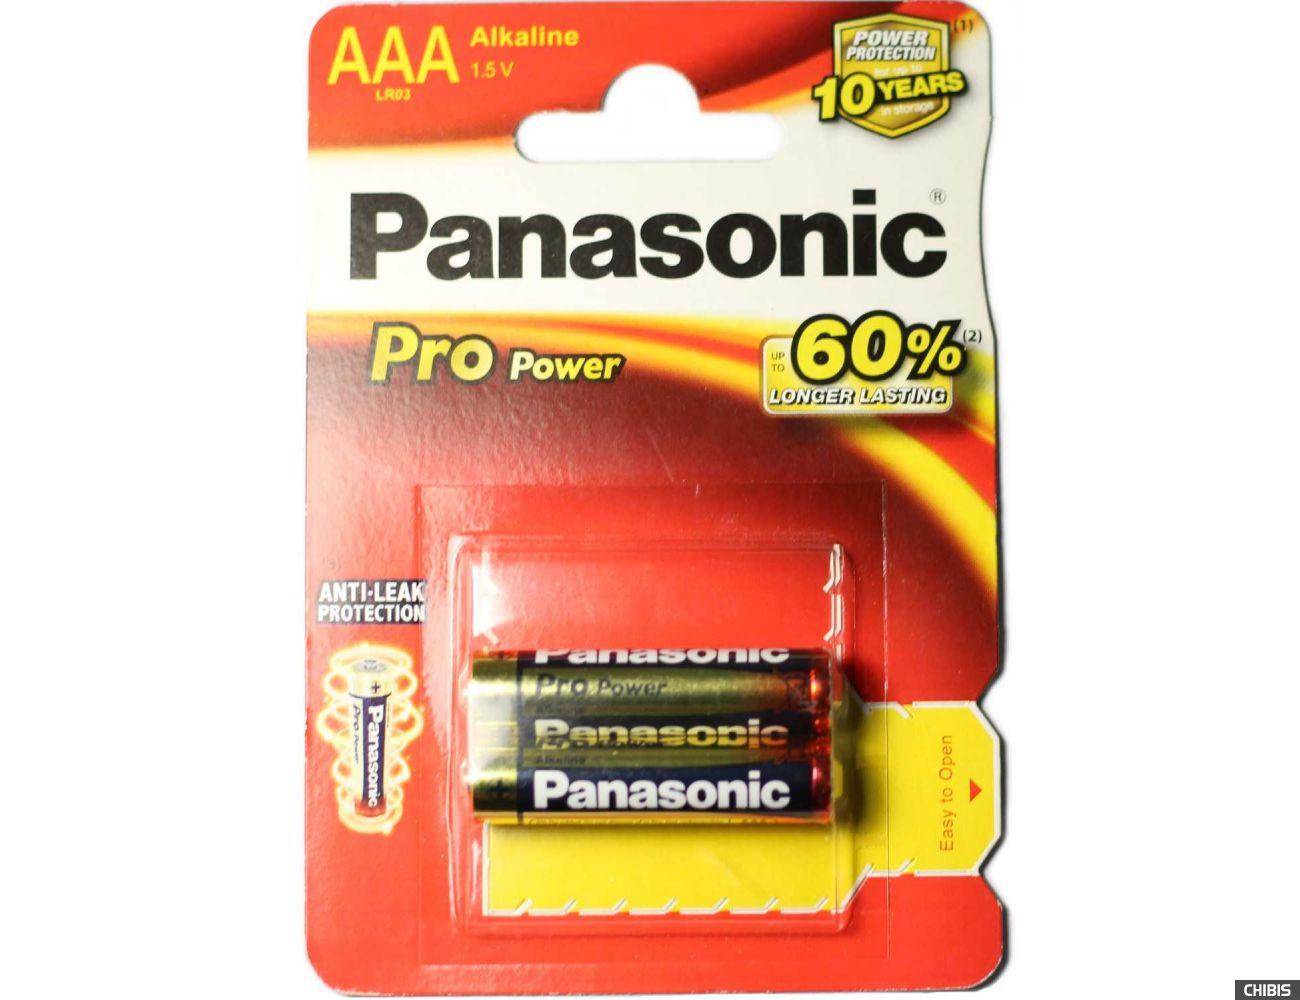 Батарейка ААА Panasonic Pro Power Alkaline LR03 1.5V блистер 2/2 шт.